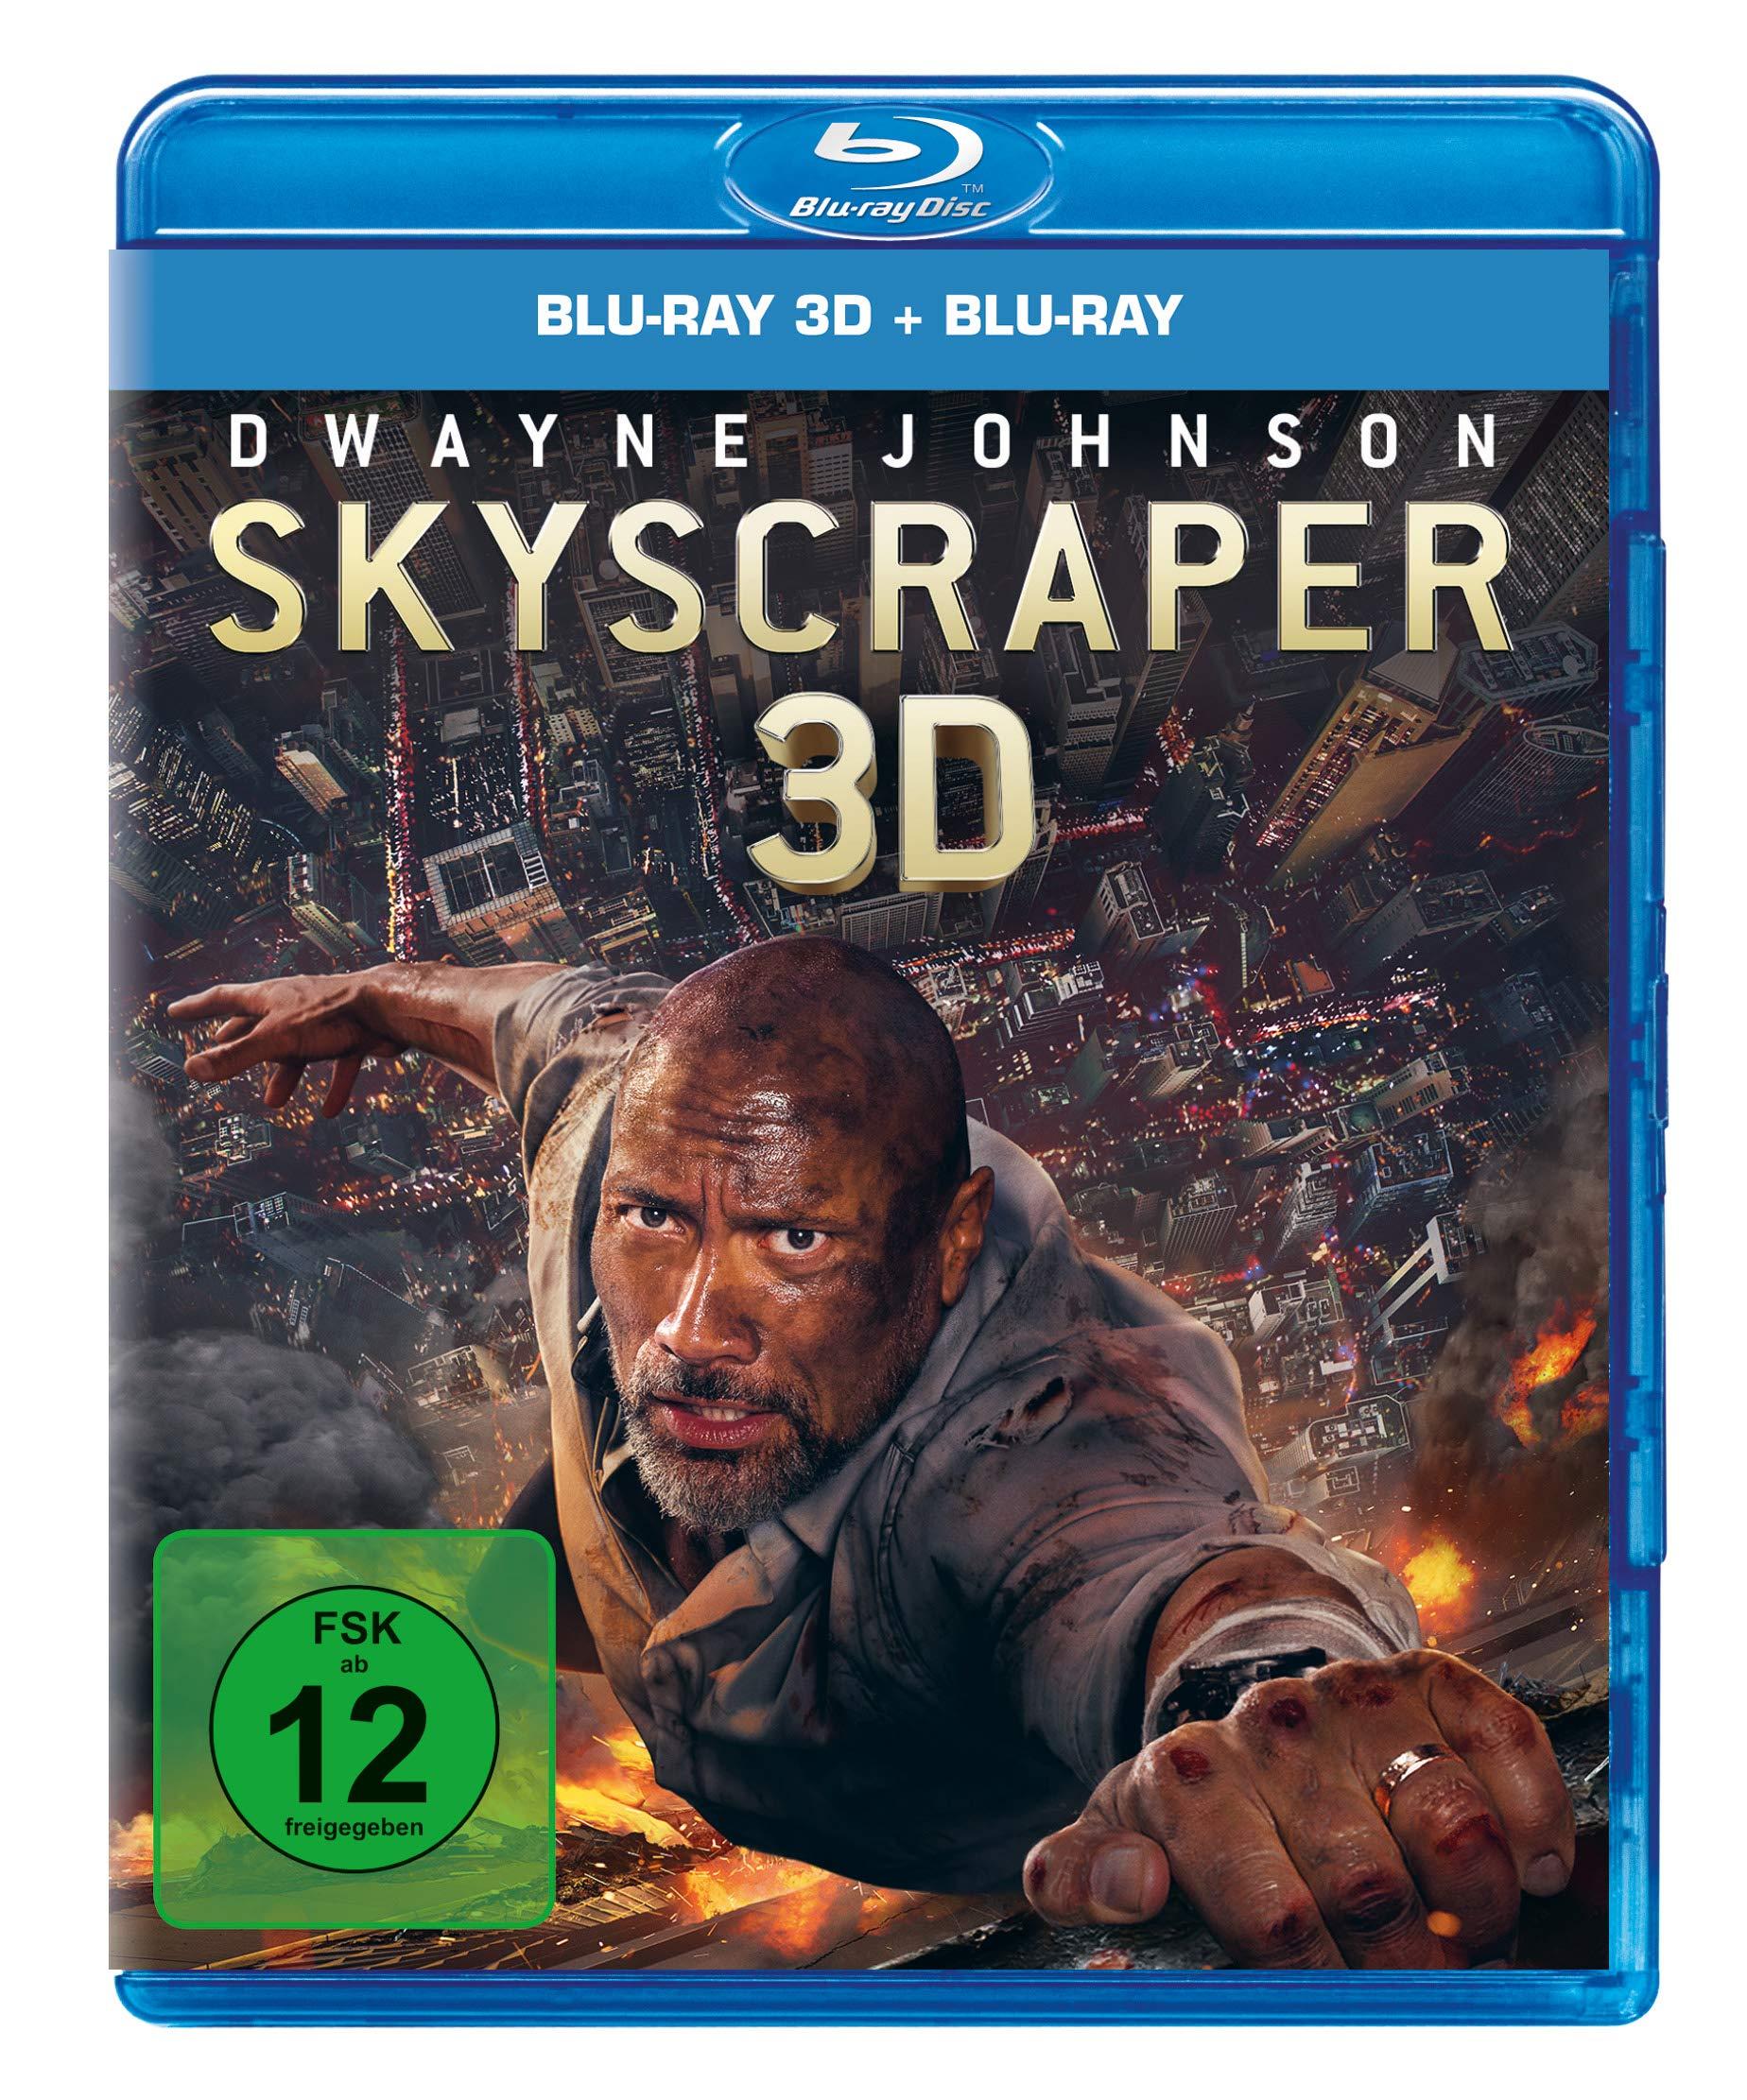 download Skyscraper.2018.3D.HSBS.German.DTS.DL.1080p.BluRay.x264-LeetHD